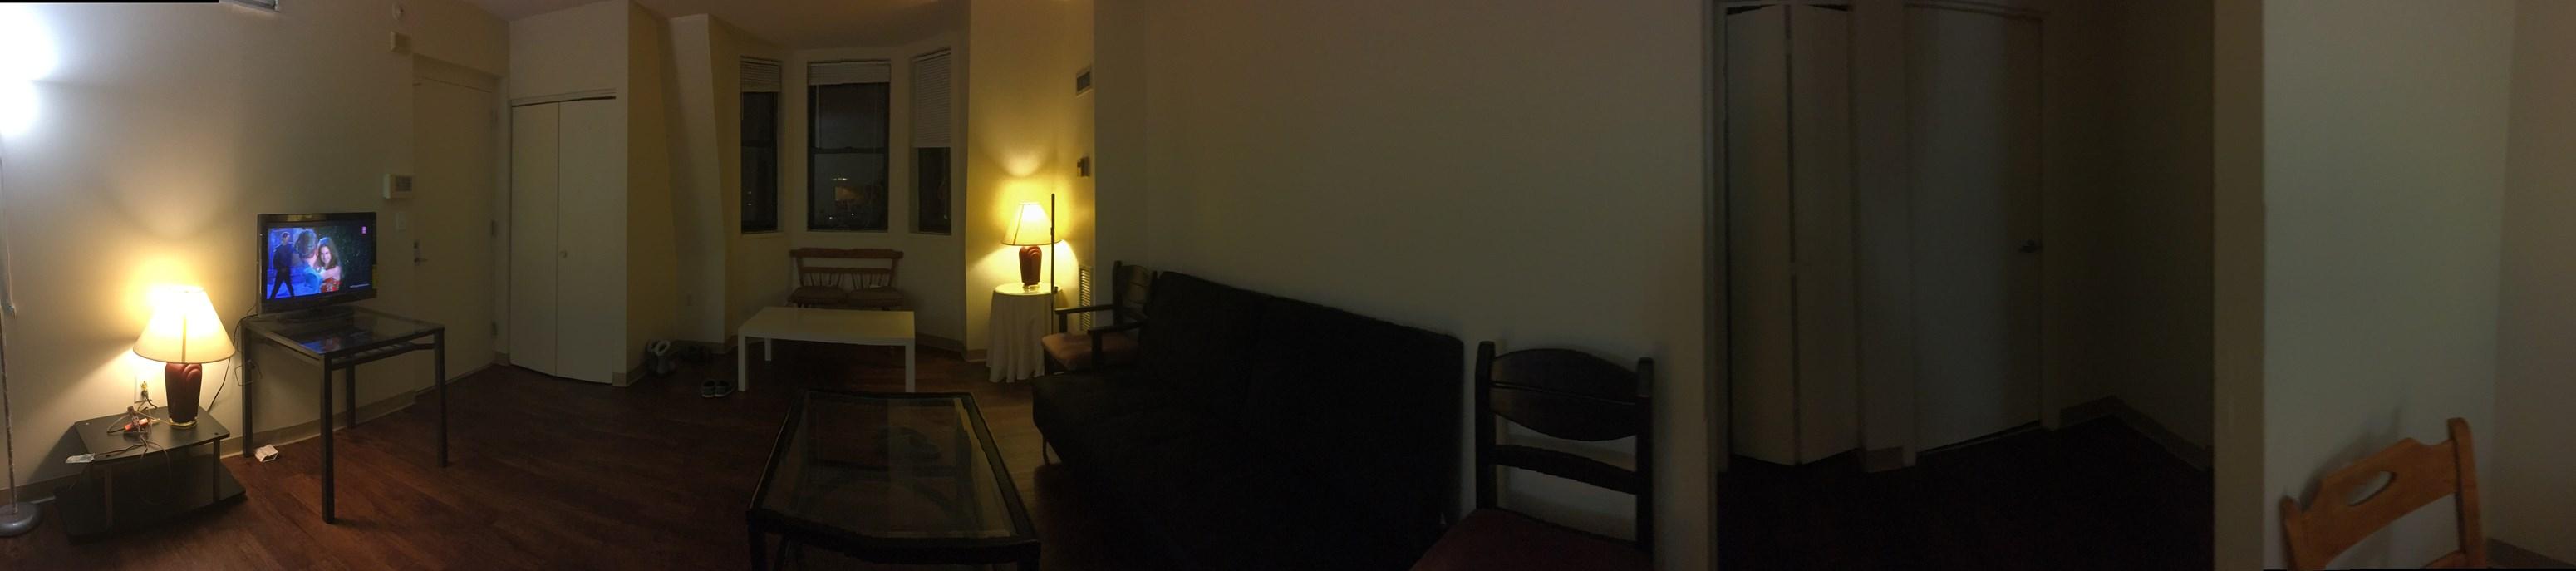 Rent A Room Near Boston University